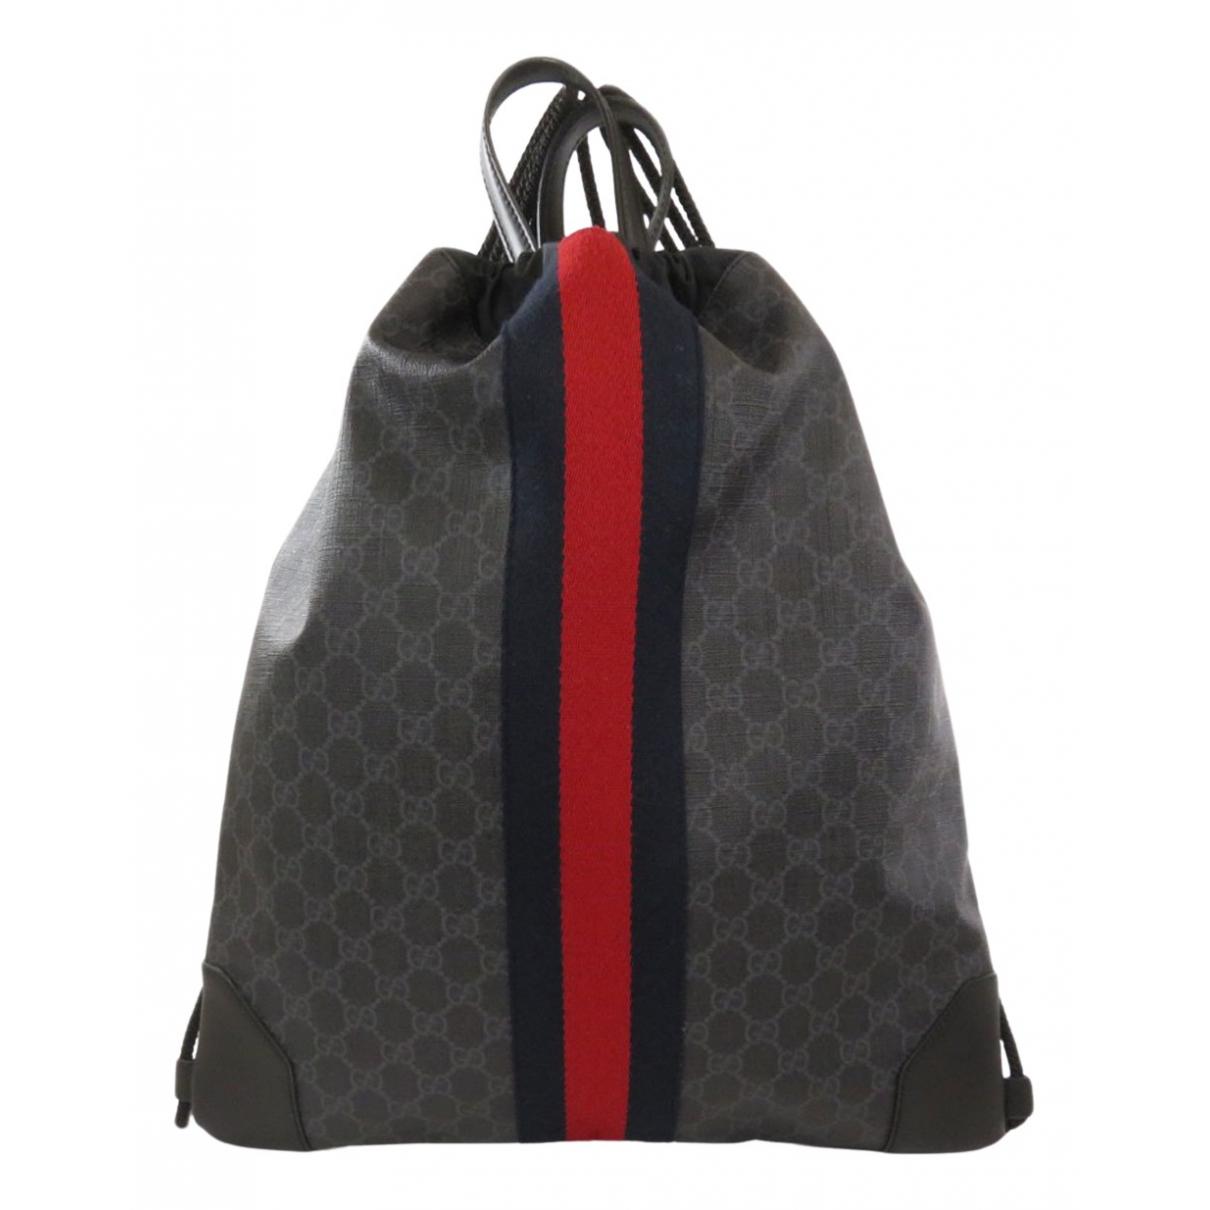 Gucci N Anthracite Cloth bag for Men N